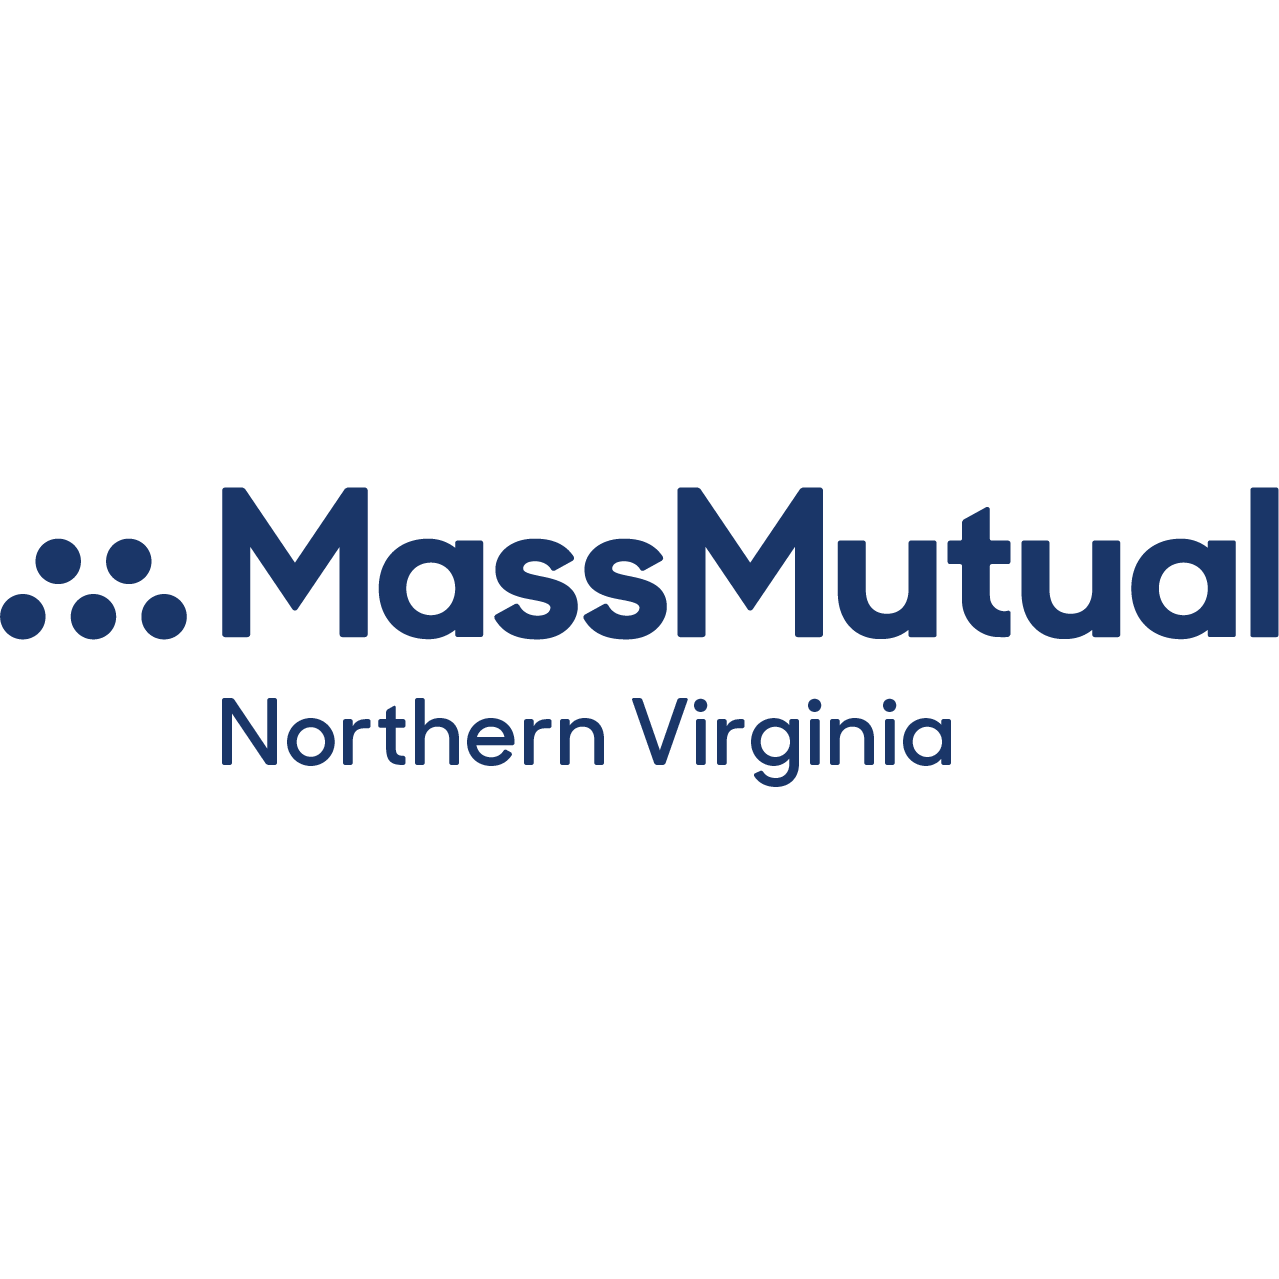 MassMutual Northern Virginia